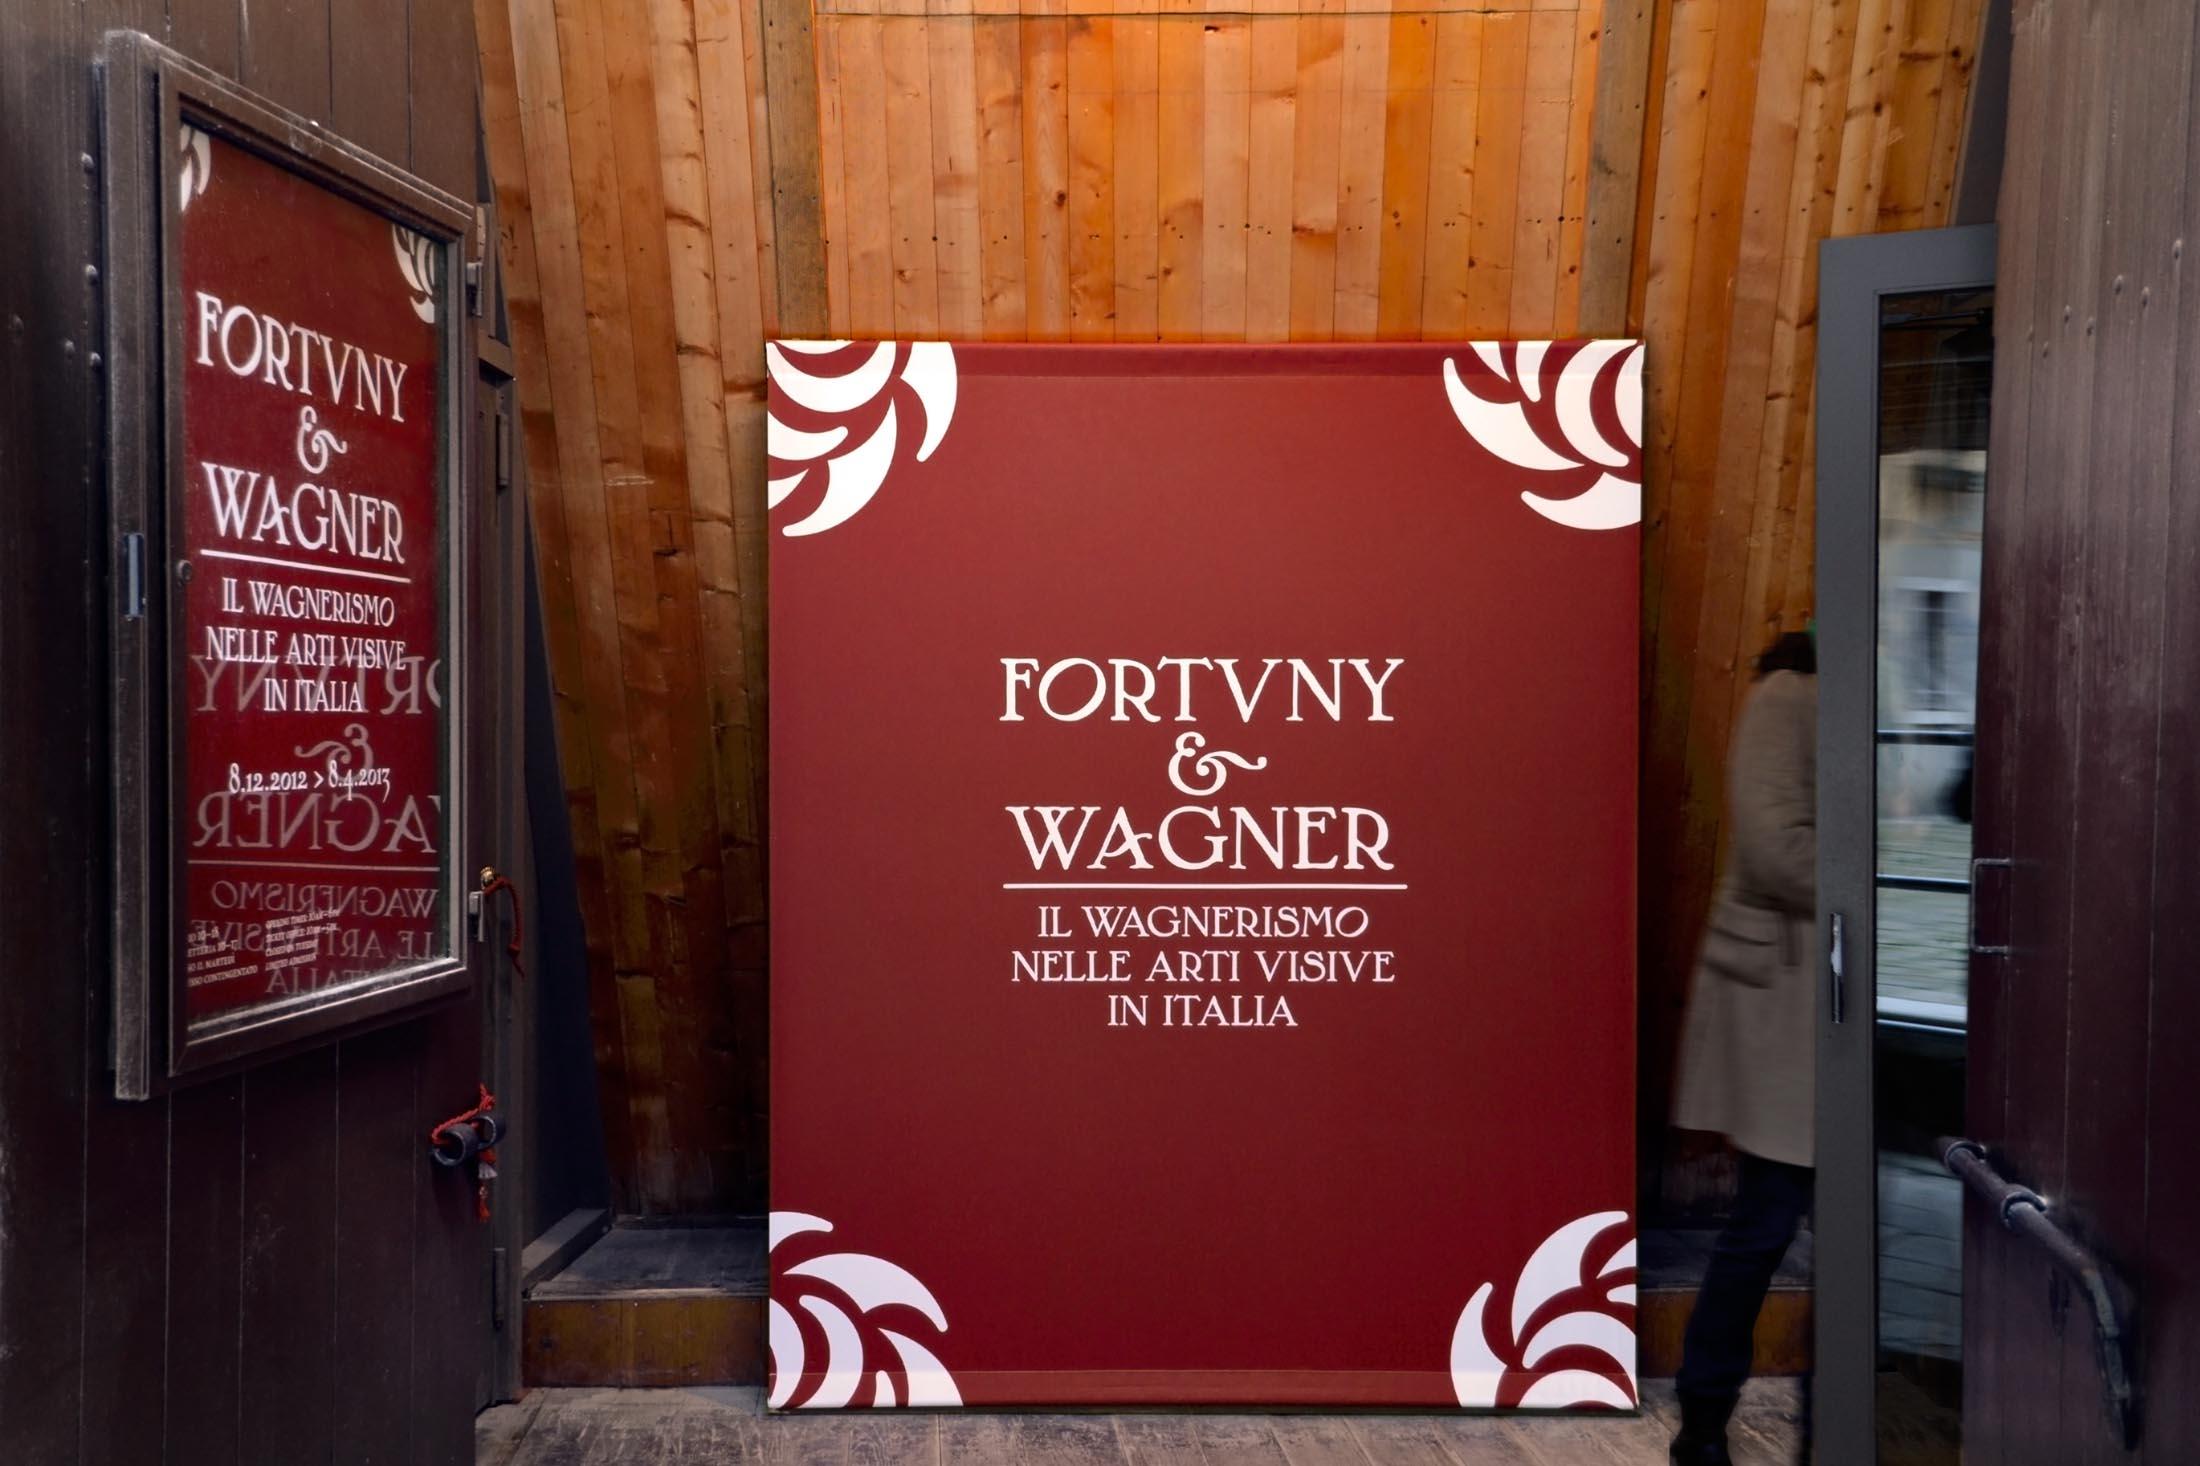 Fortuny & Wagner - locandina